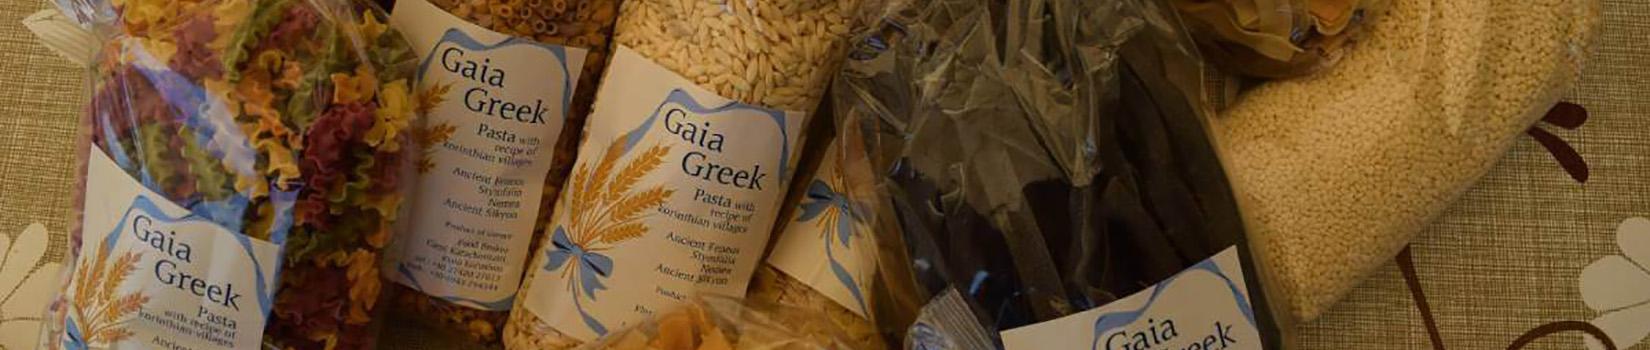 GAIA GREEK